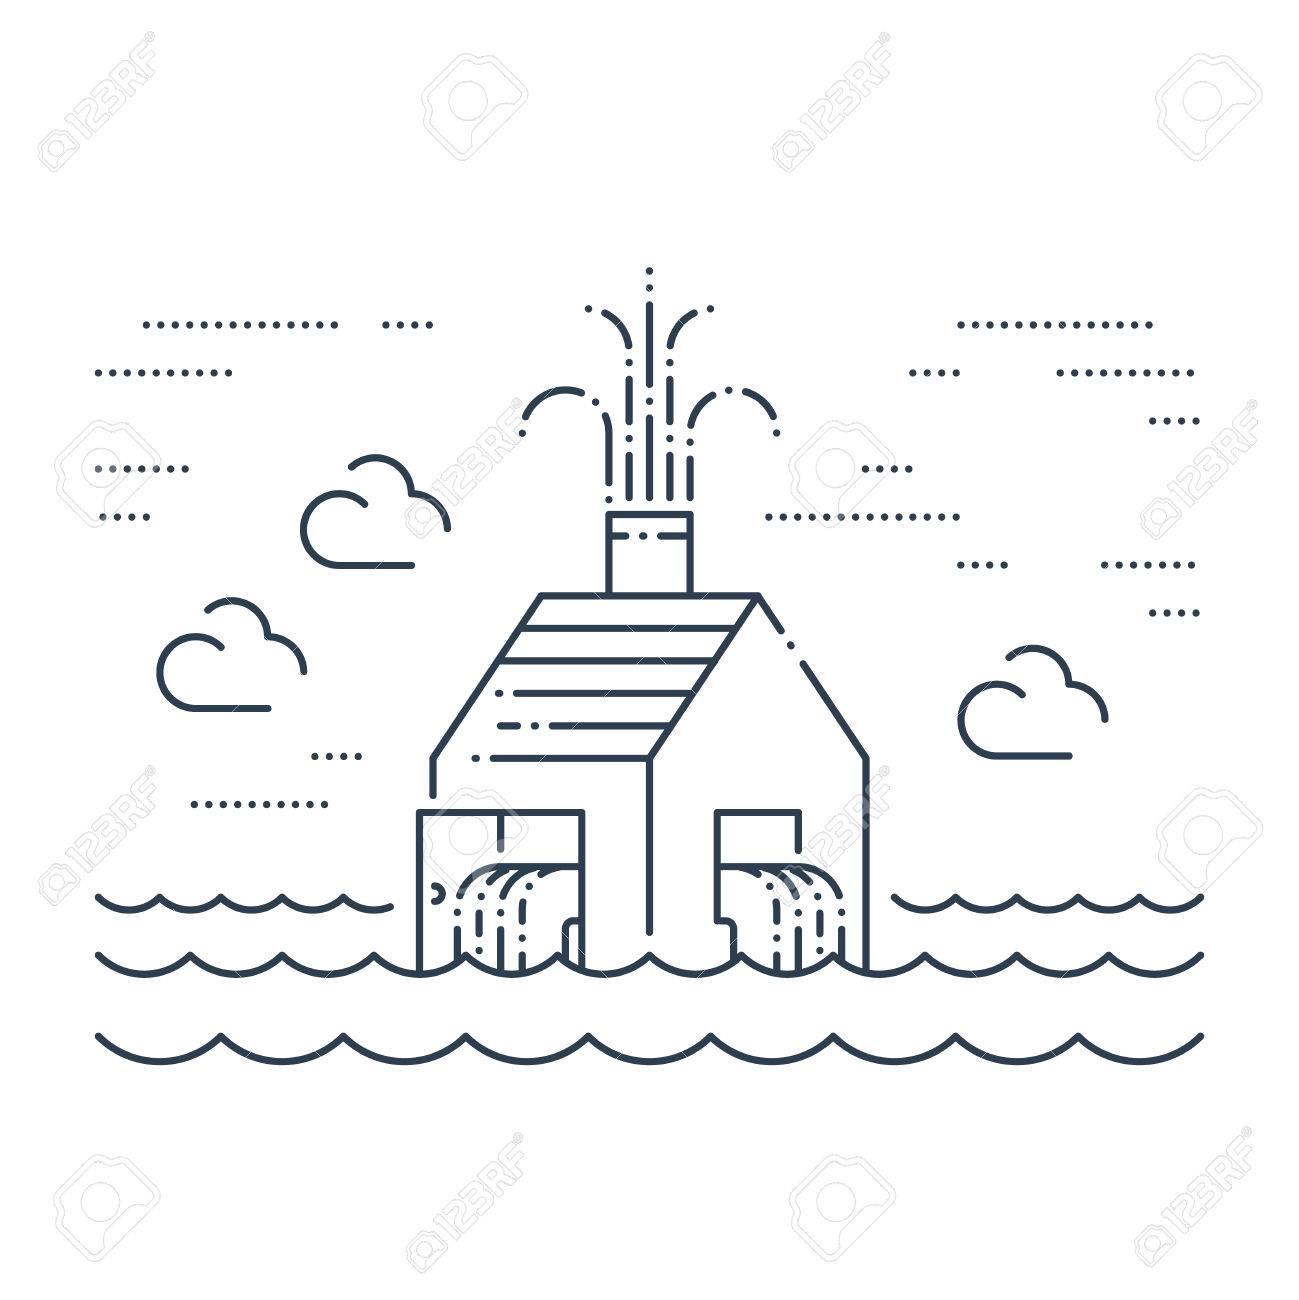 Pipe break, poor plumbing, flooding. Insurance service concept. - 49711765